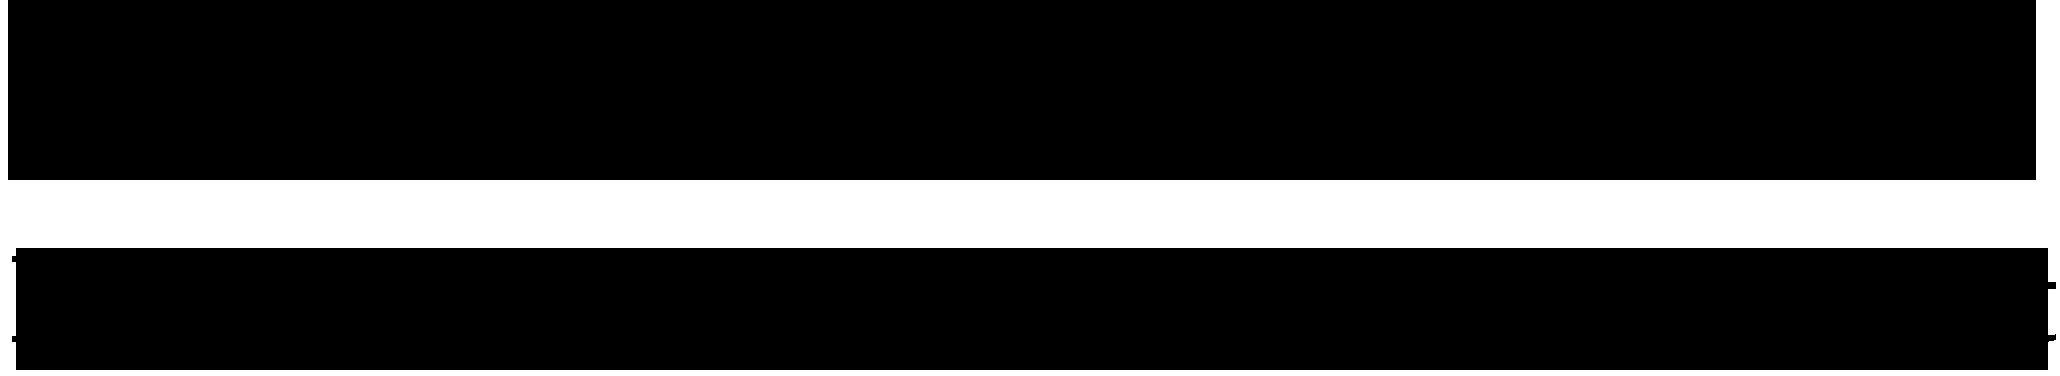 muiris-houston-logo